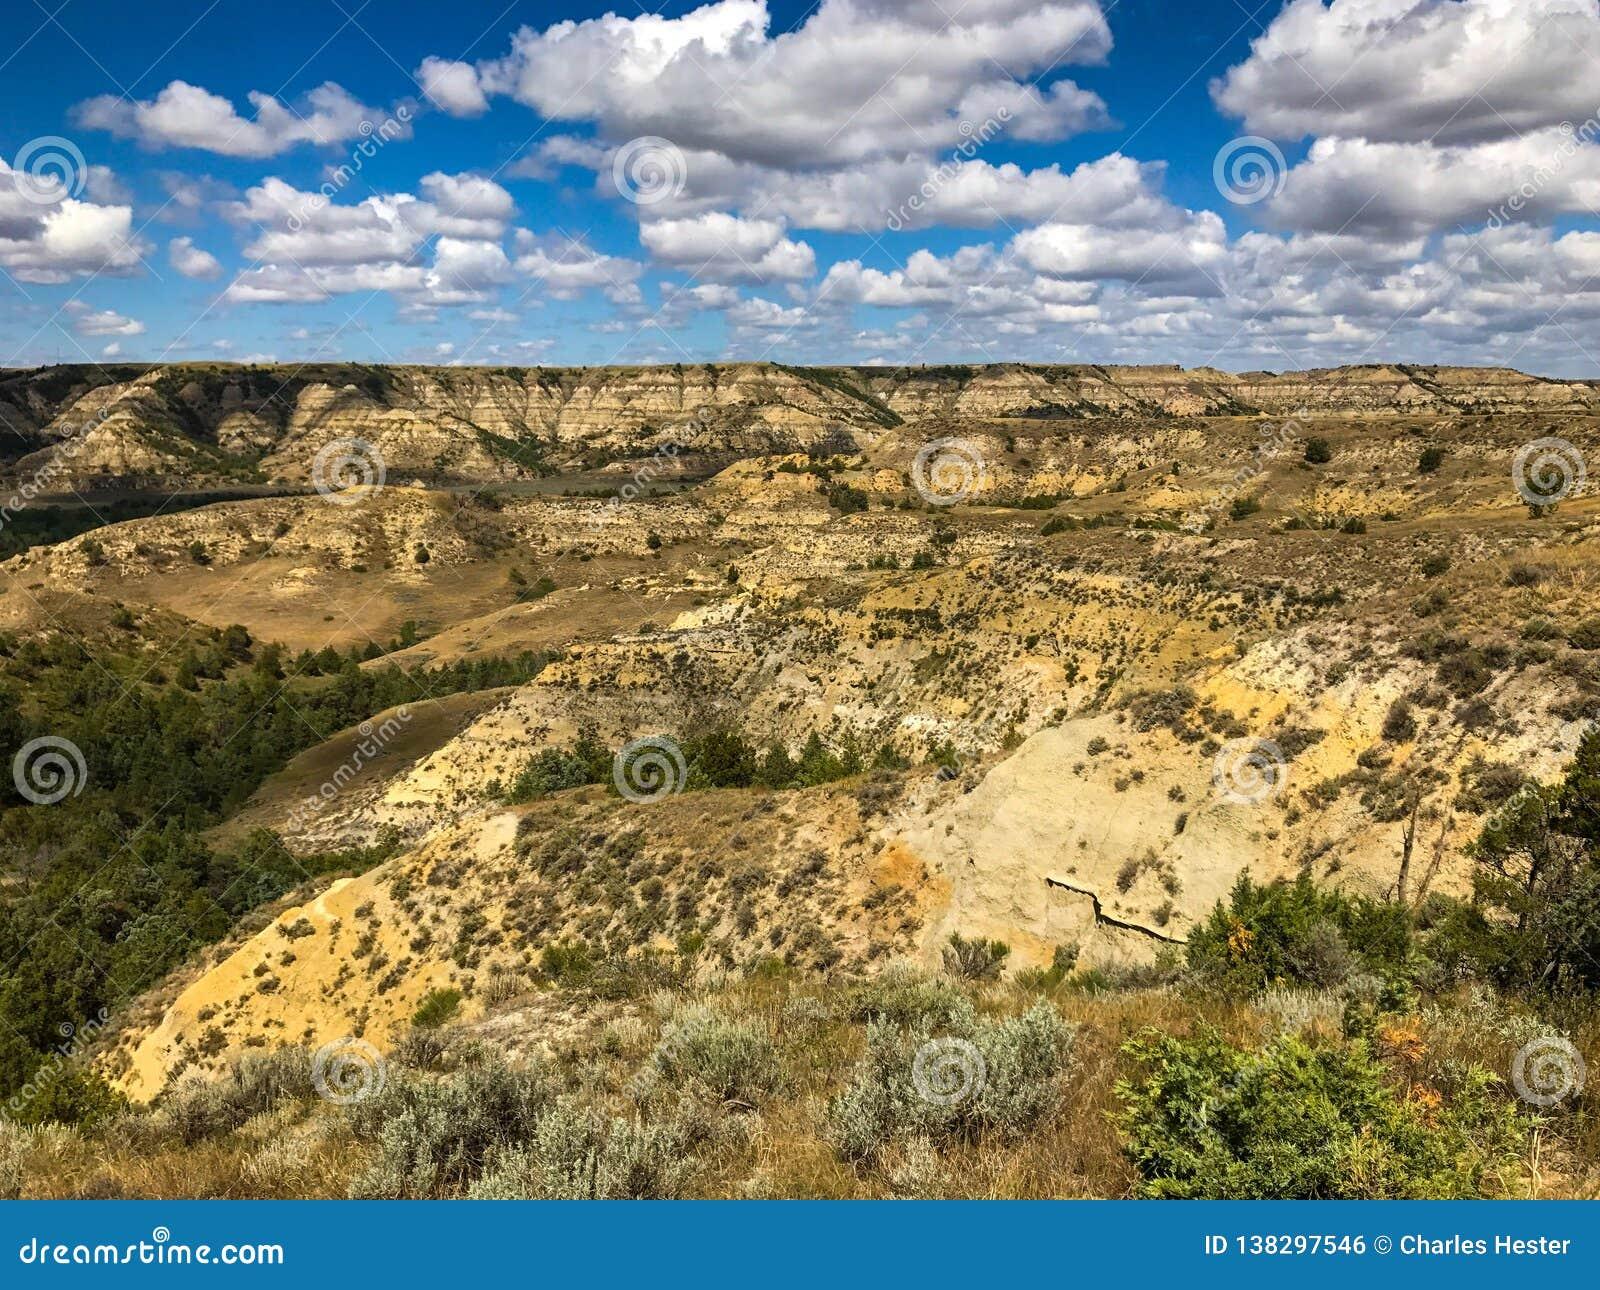 Theodore Rosevelt National Park